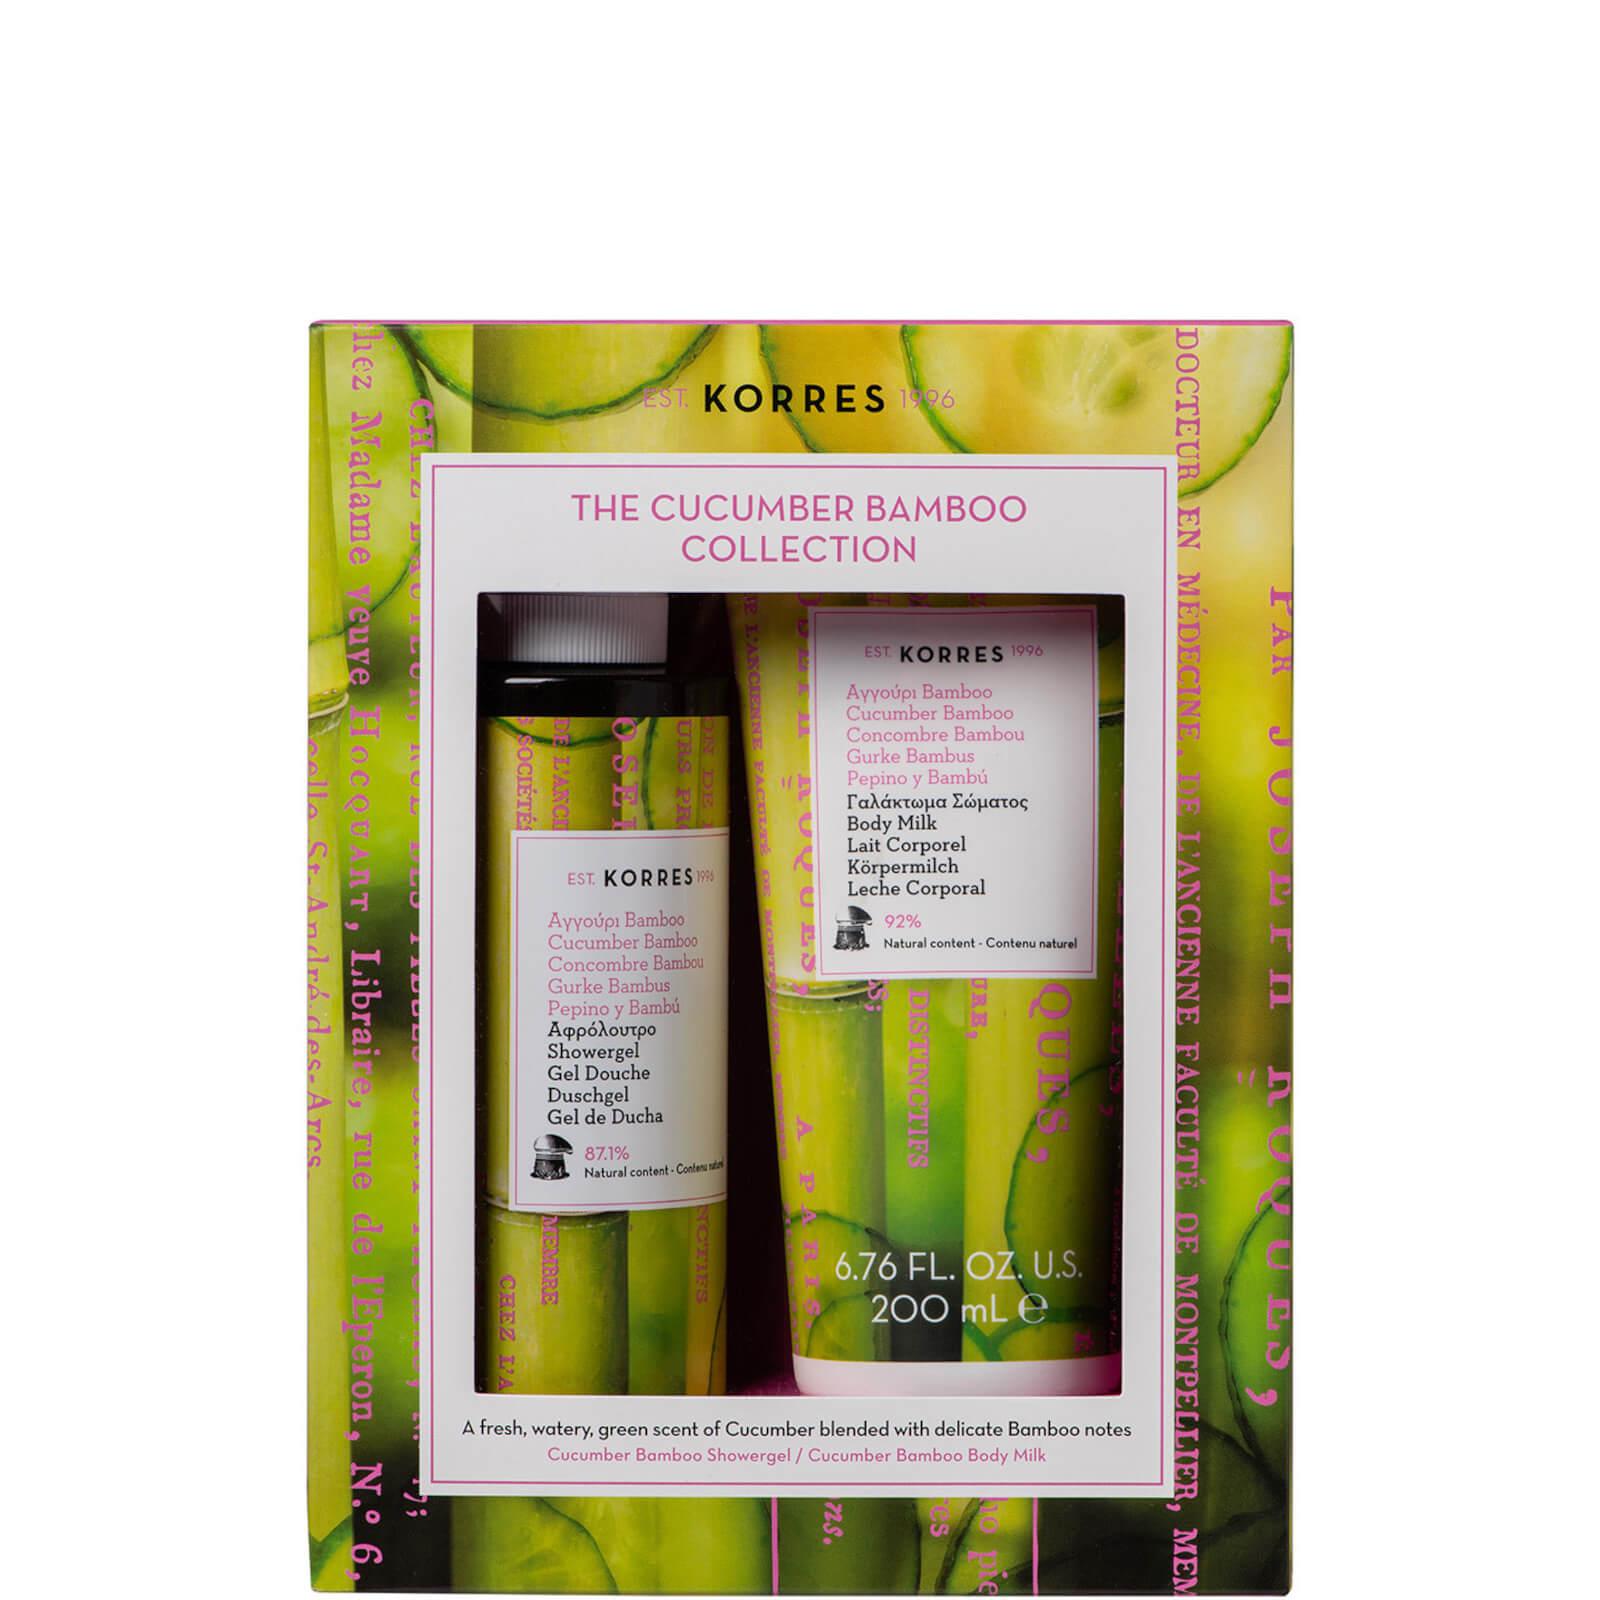 Купить Korres Cucumber and Bamboo Shower Gel Duo